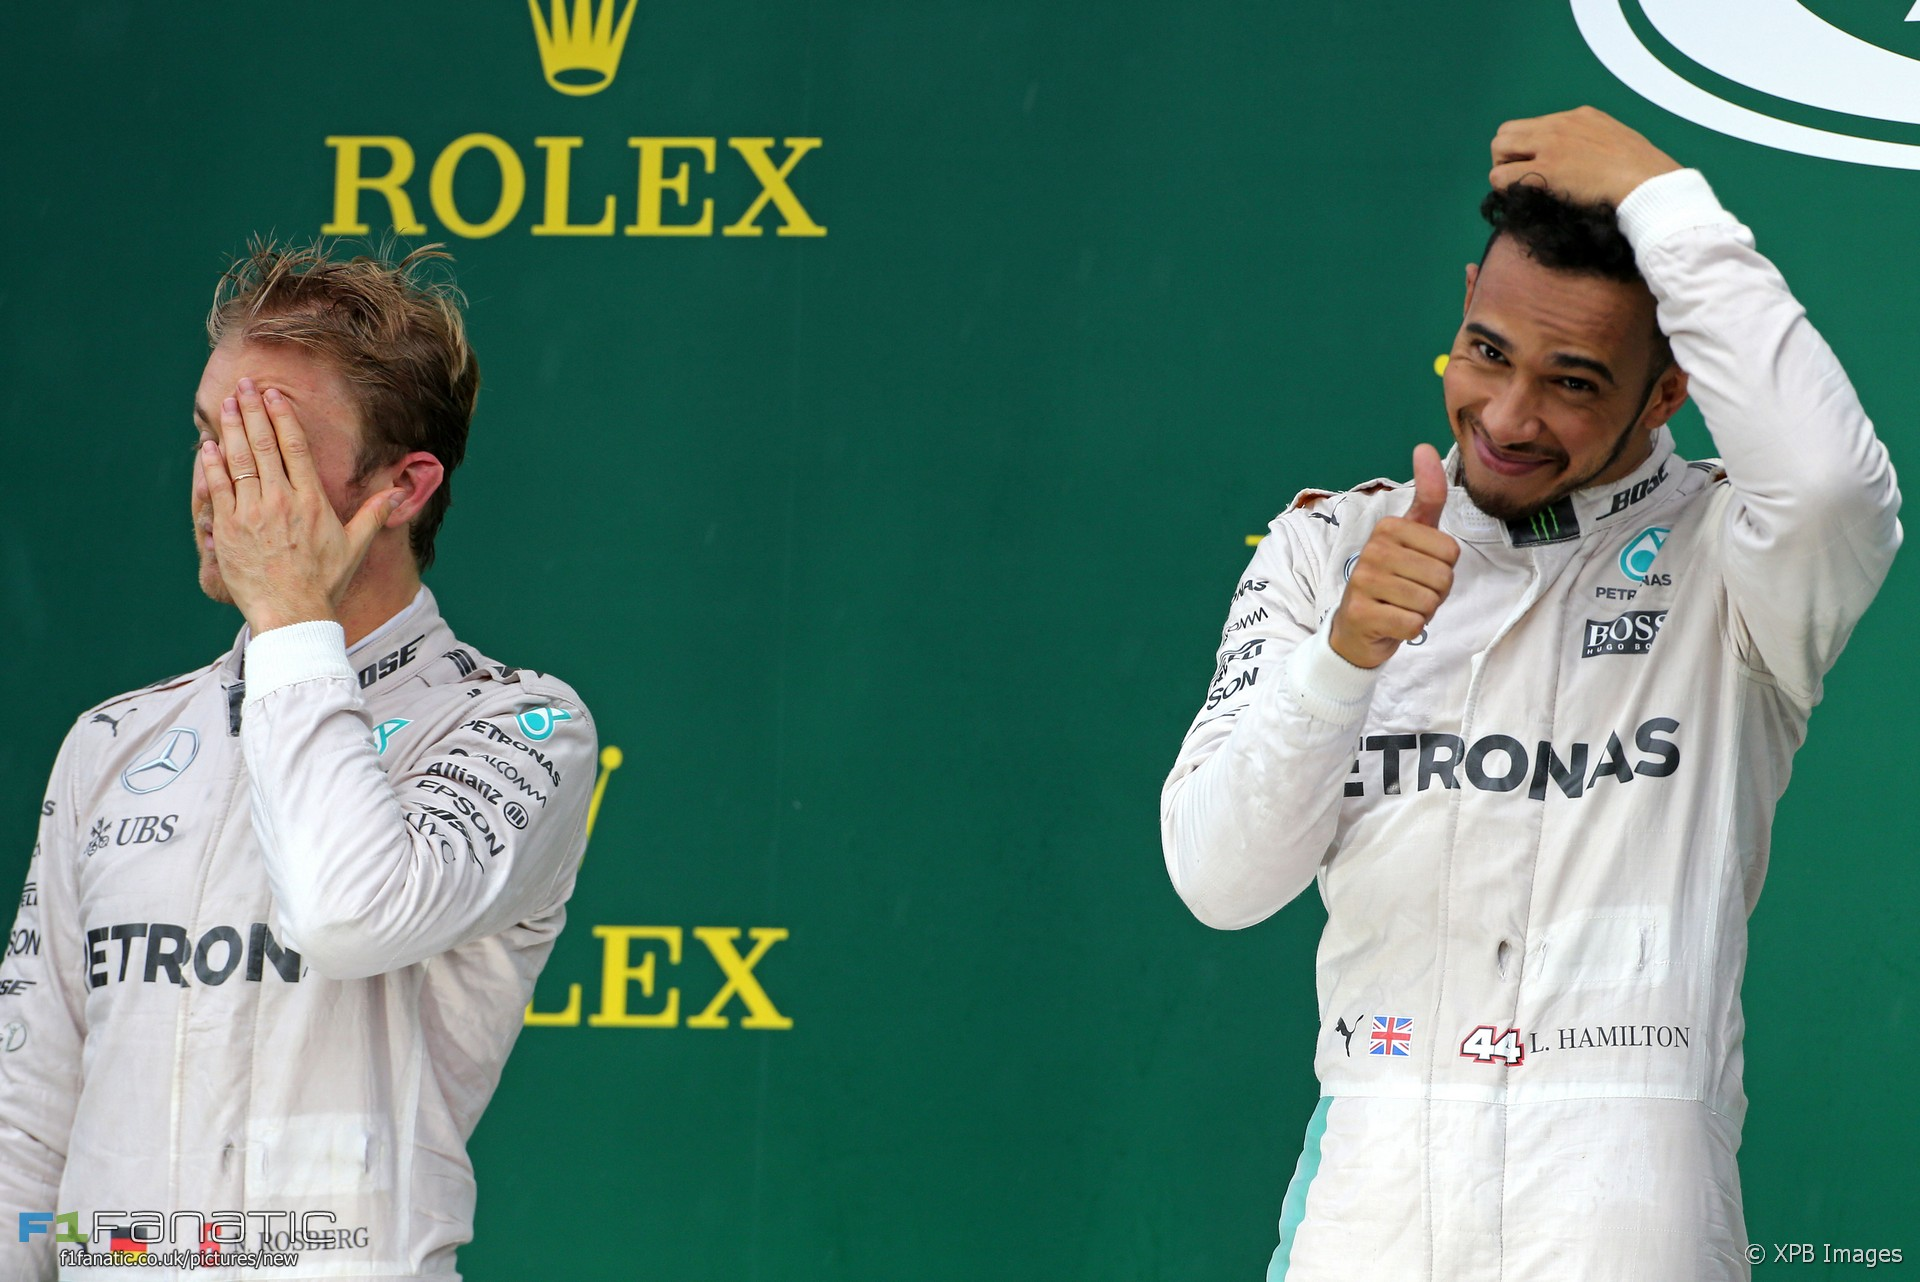 Nico Rosberg, Lewis Hamilton, Mercedes, Interlagos, 2016